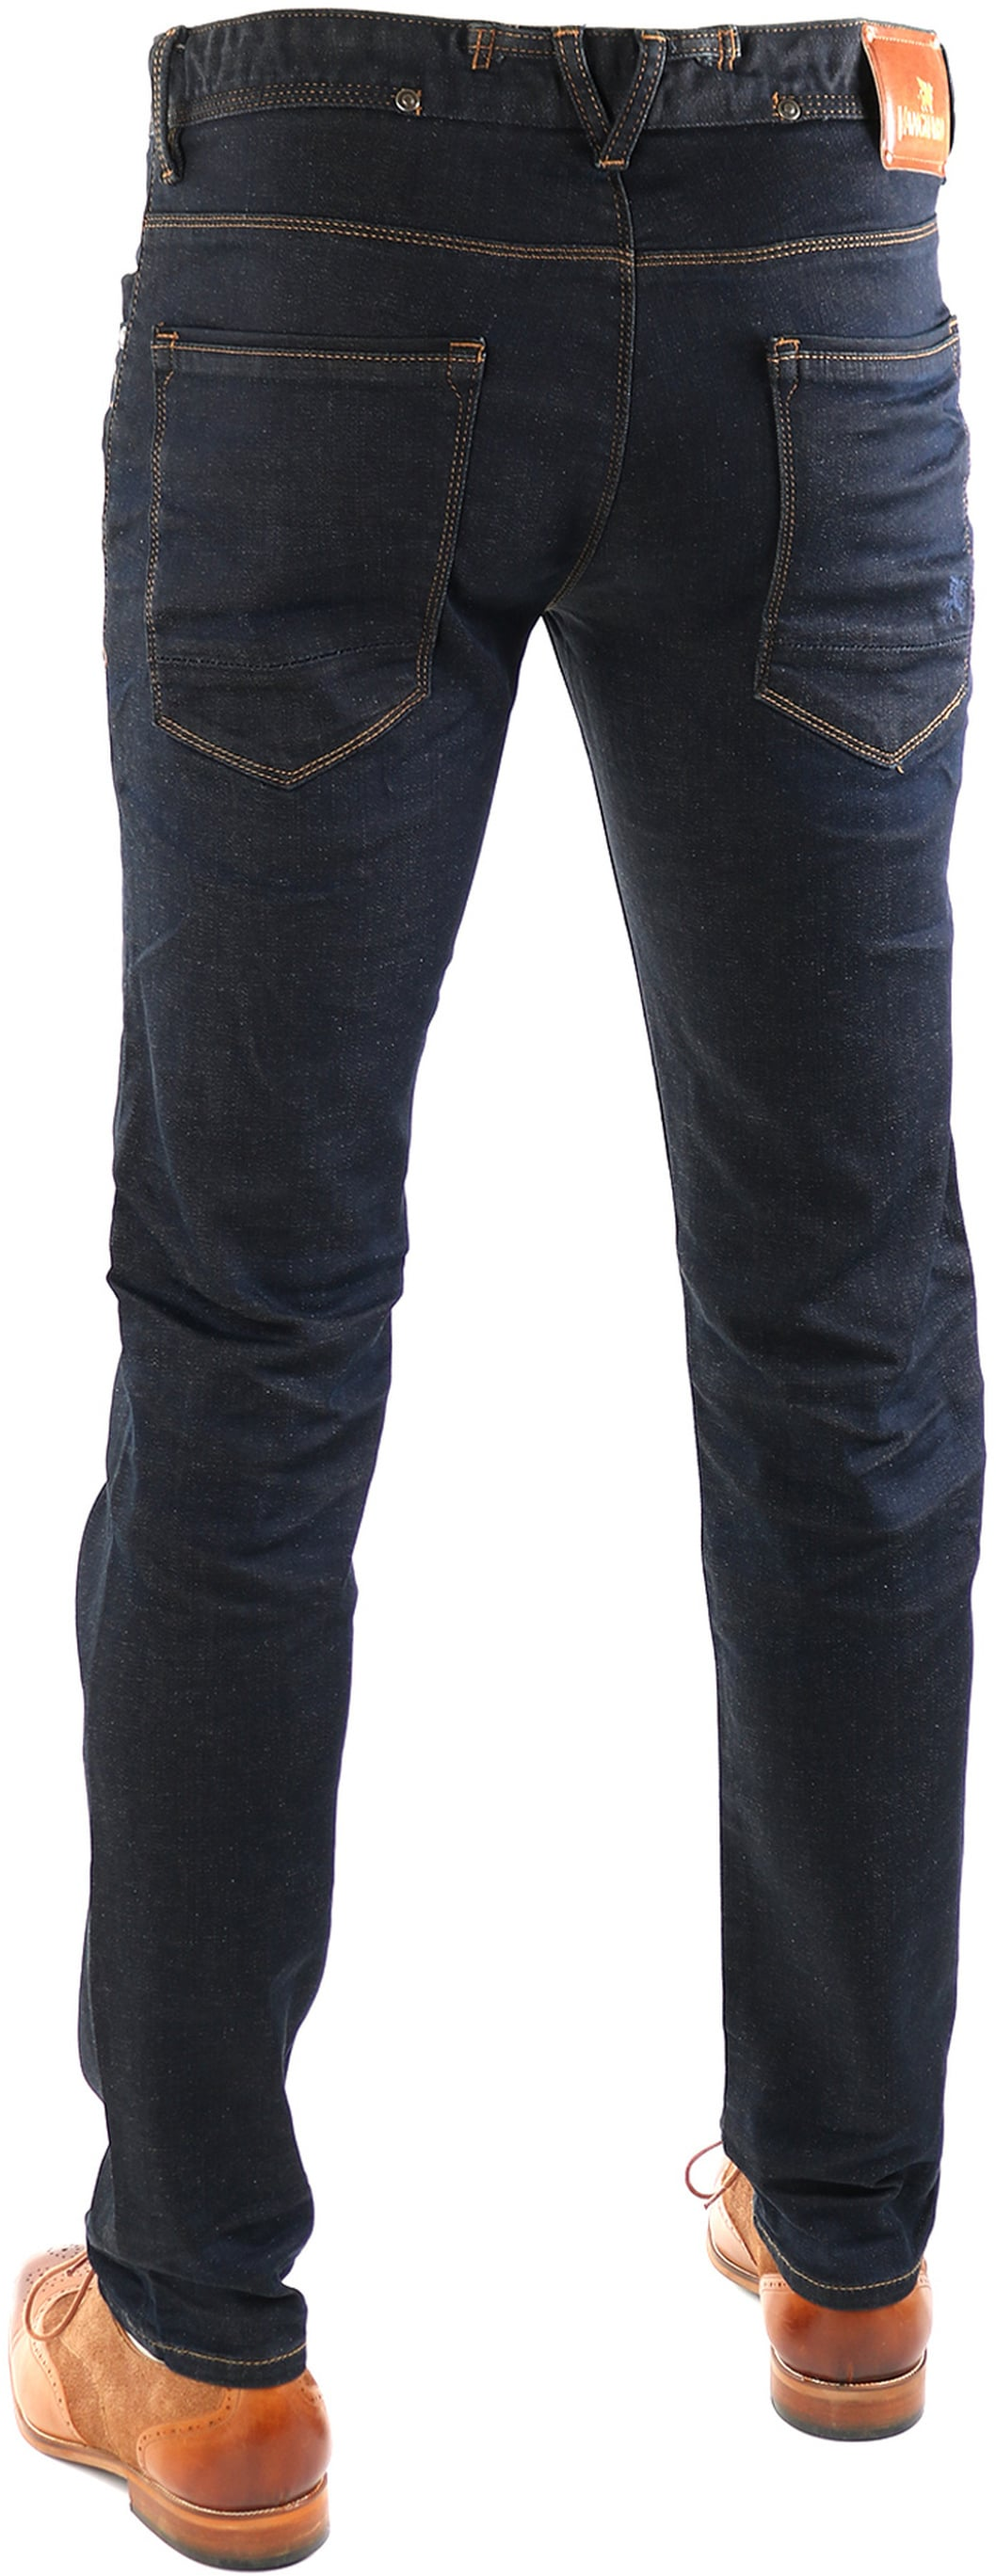 Vanguard V7 Rider Jeans Slim Fit CCR foto 4